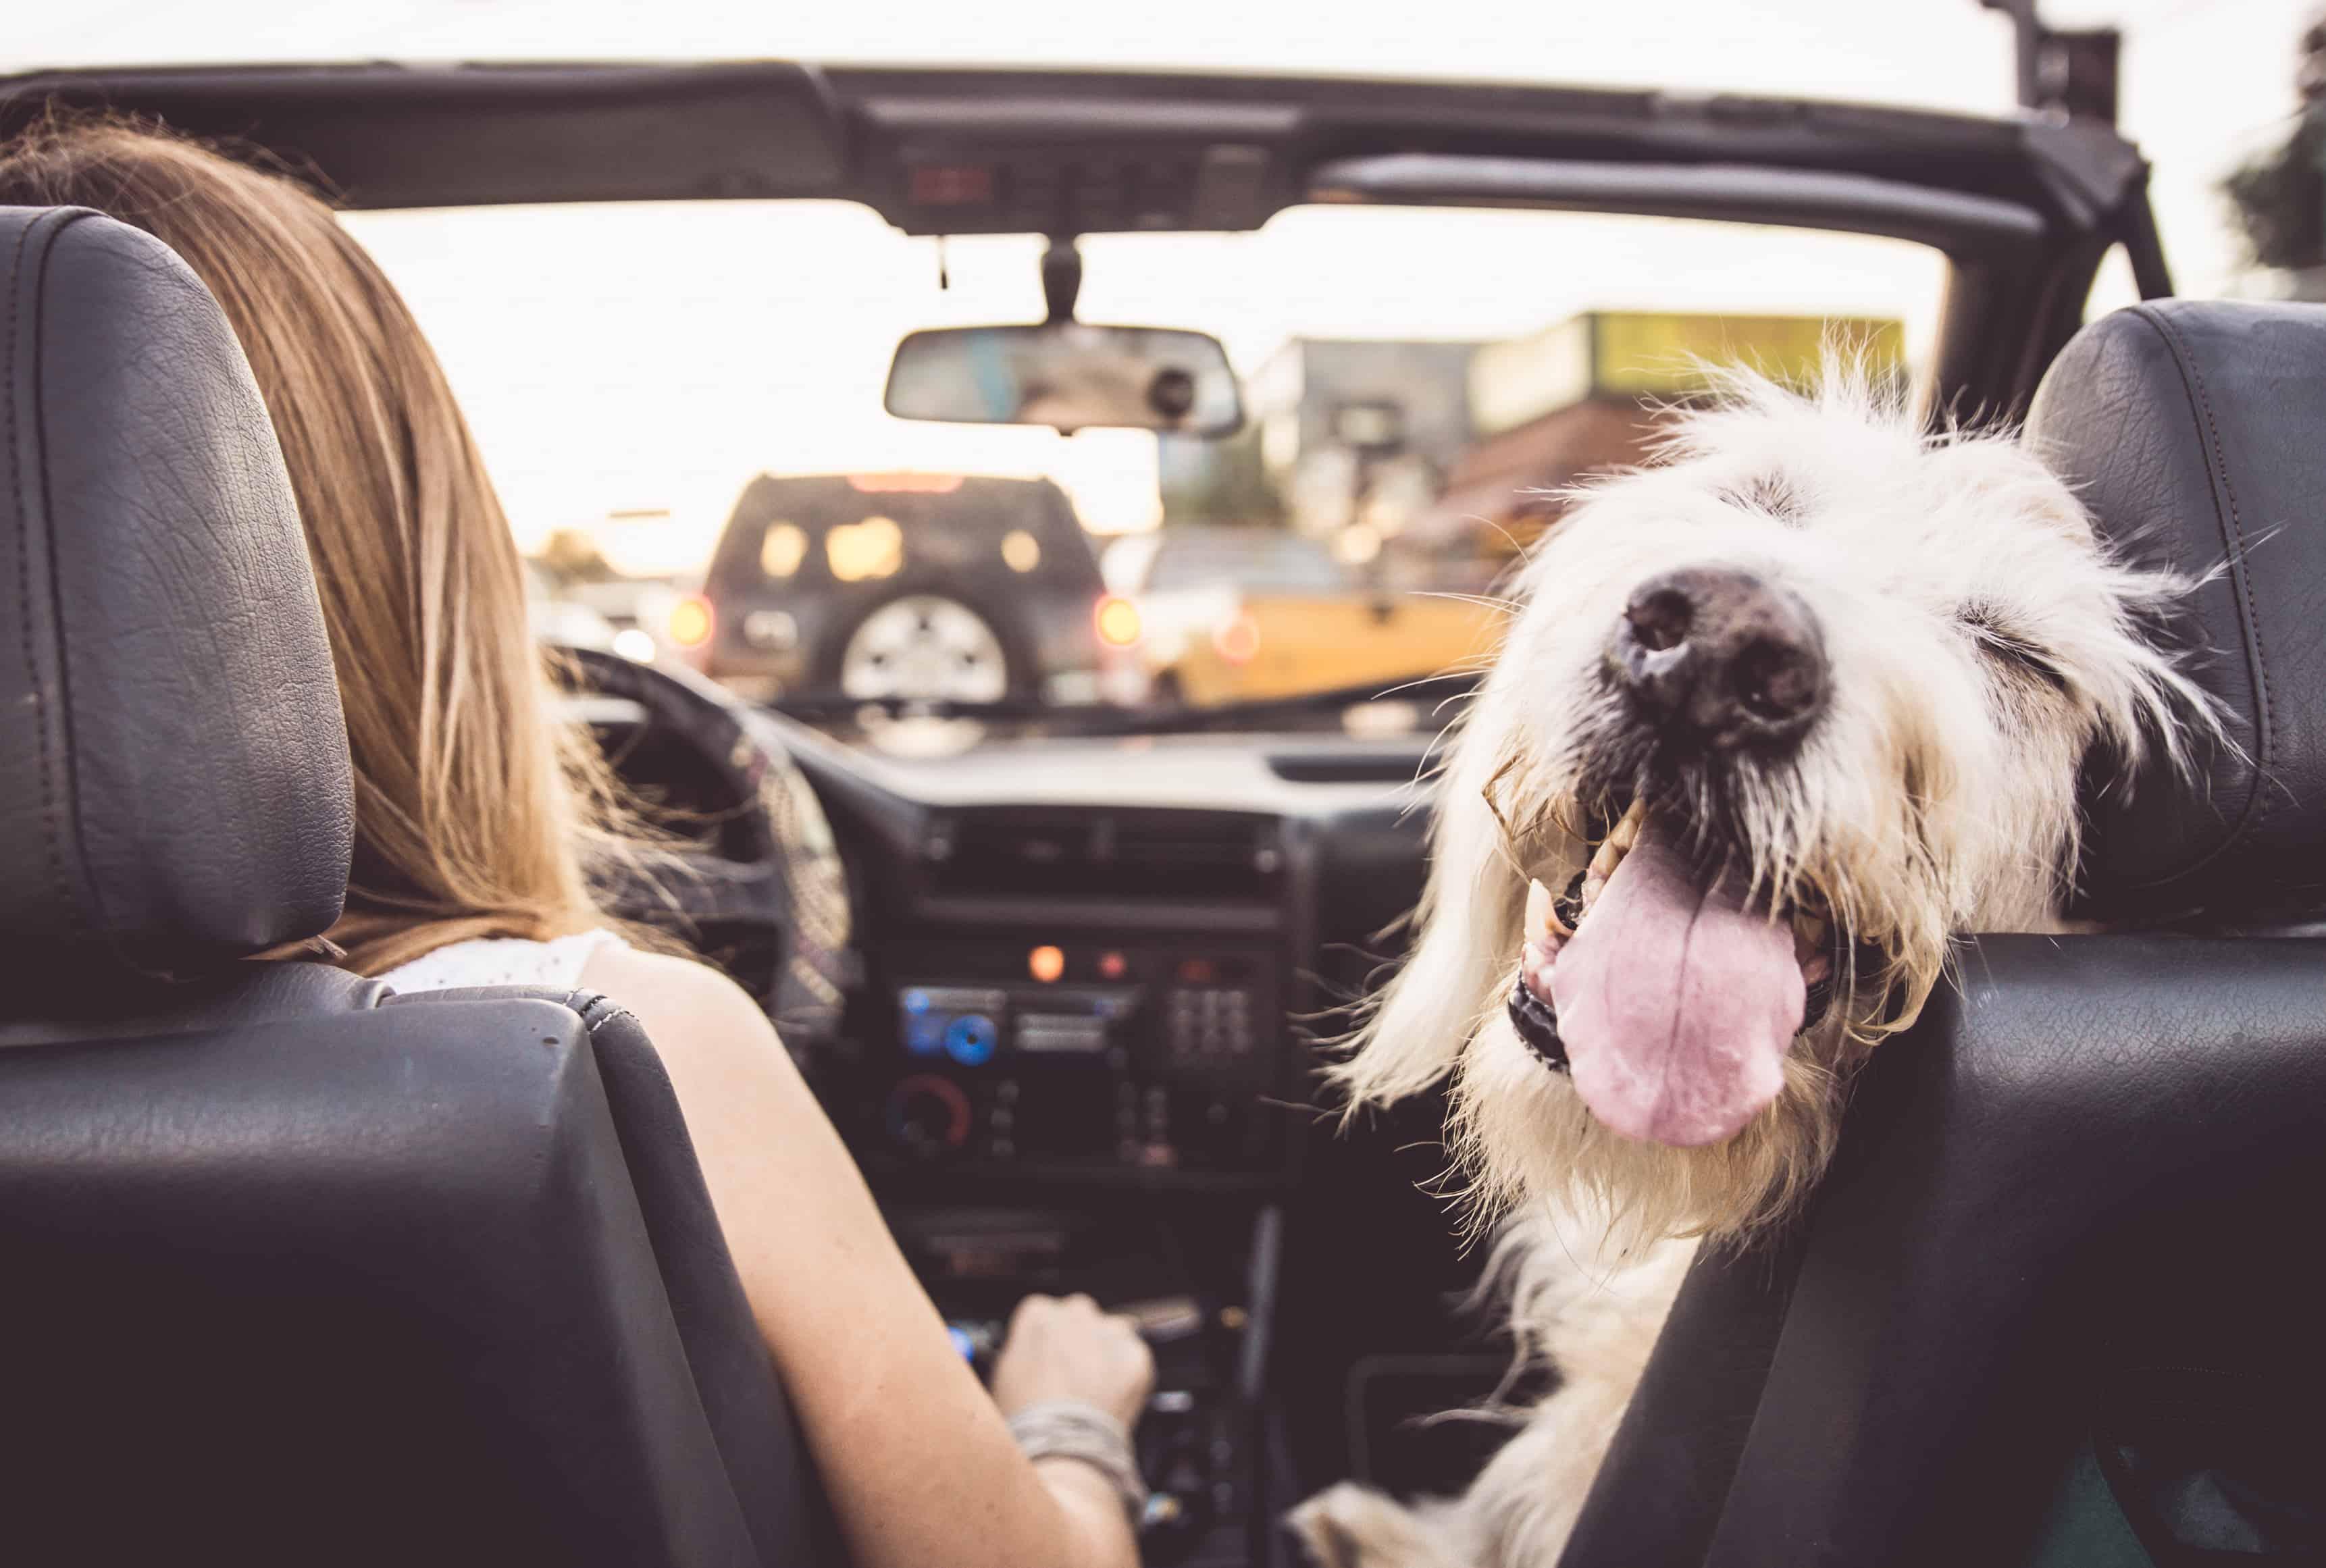 Podróż samochodem z psem lub kotem